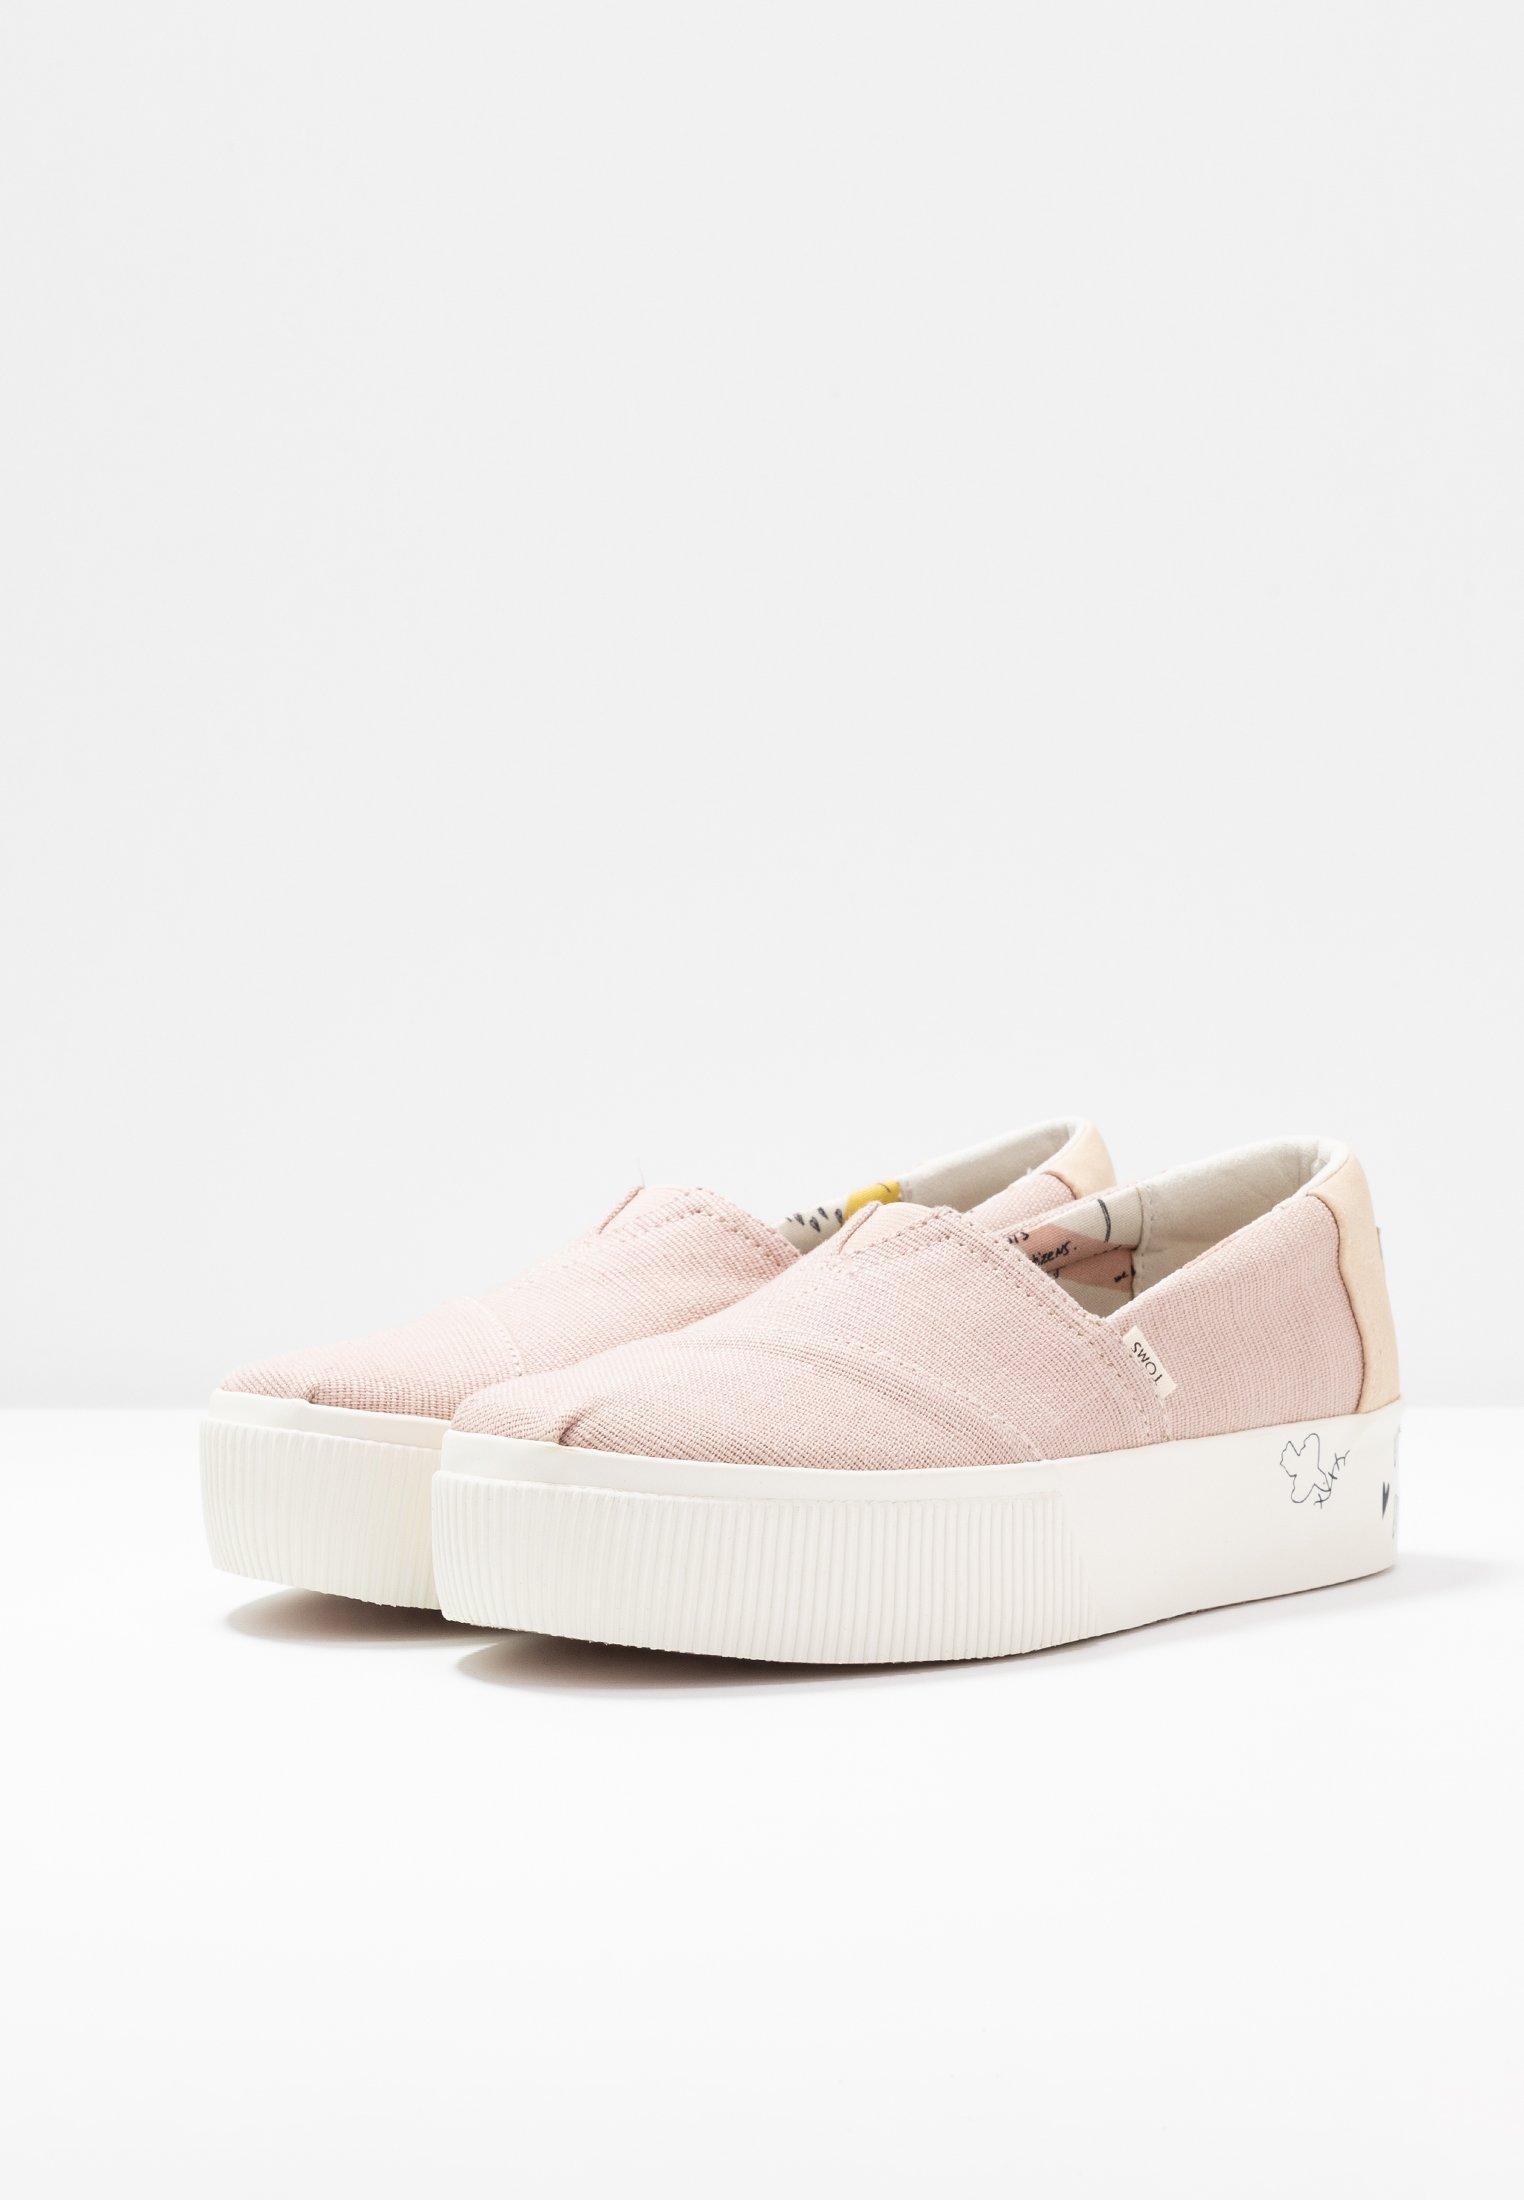 TOMS ALPARGATA BOARDWALK - Mocassins pink